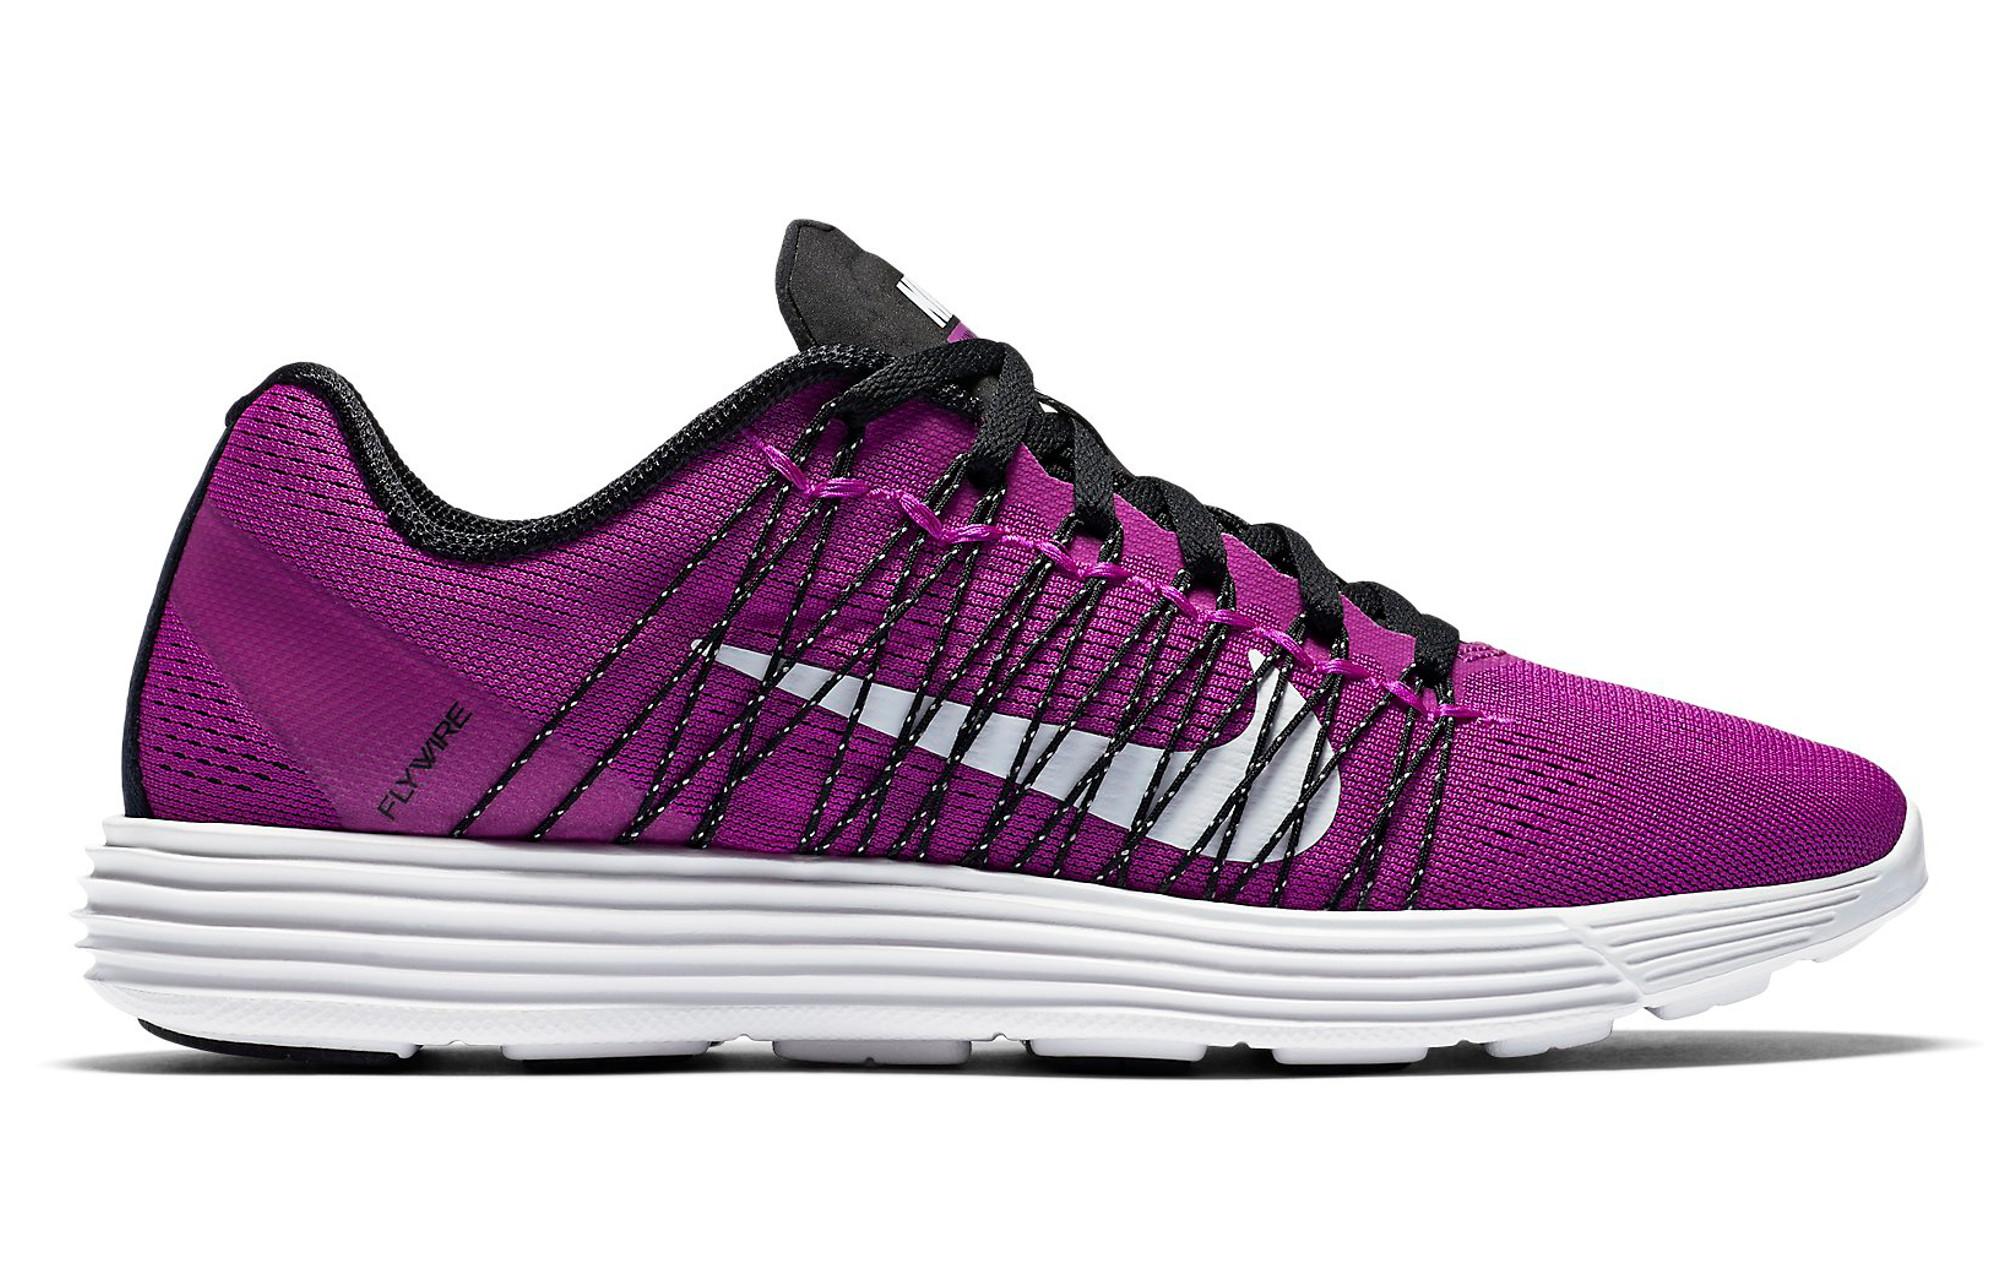 sale retailer 15eaf 0e5bd Chaussures de Triathlon Femme Nike LUNARACER+ 3 Violet